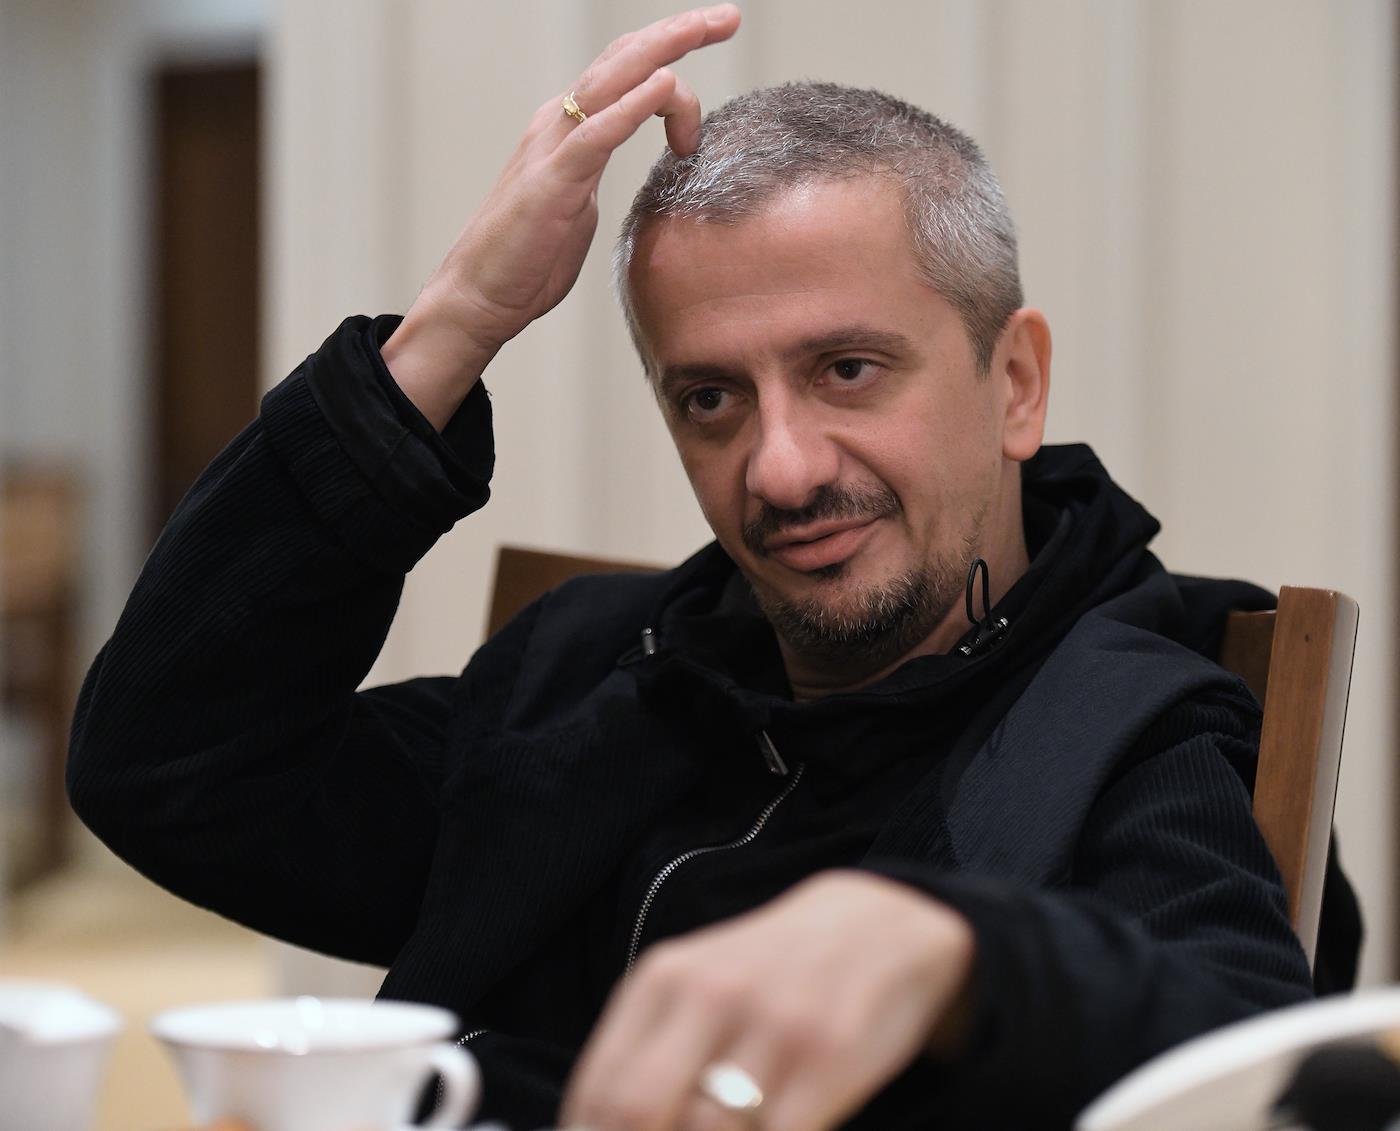 Константин Богомолов<br><br>автор фото&nbsp;Евгений Павленко/Коммерсантъ